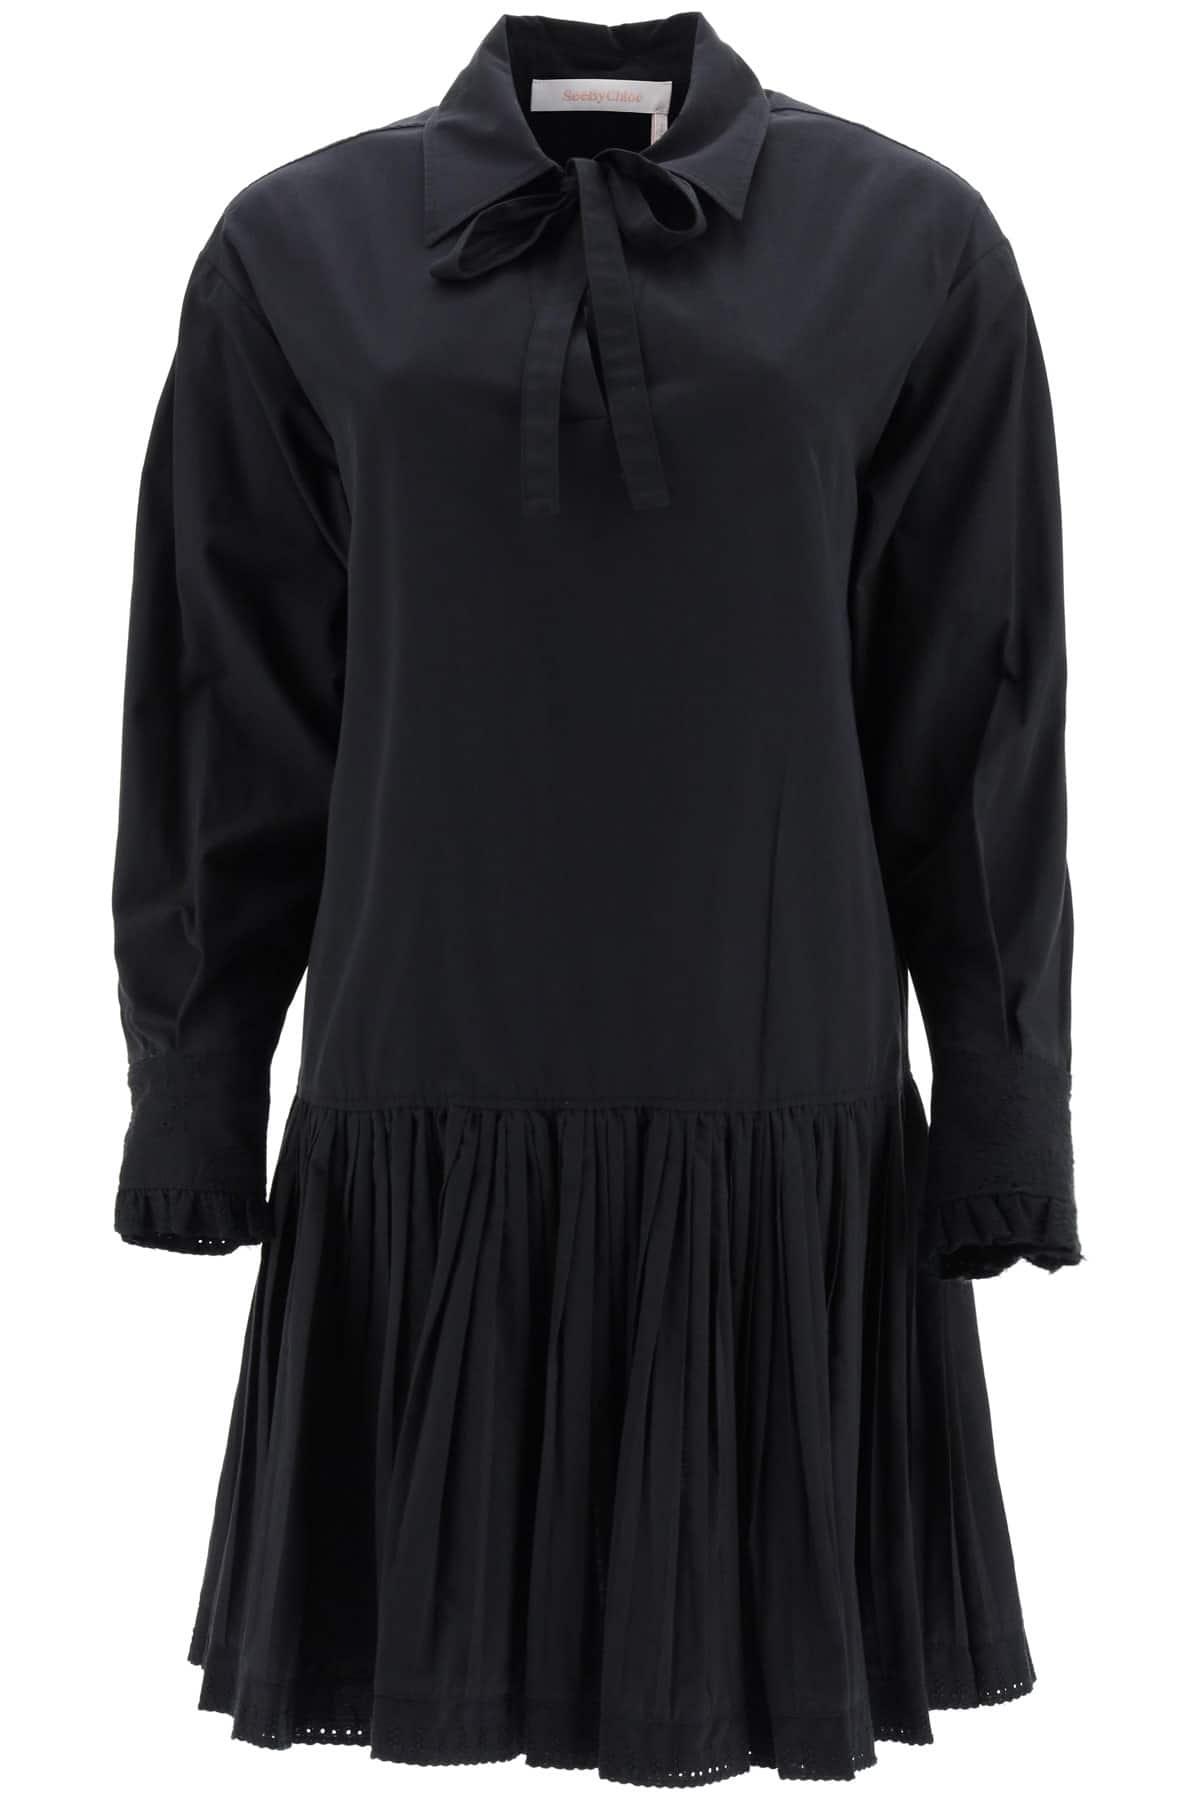 SEE BY CHLOE COTTON MINI DRESS 36 Black Cotton